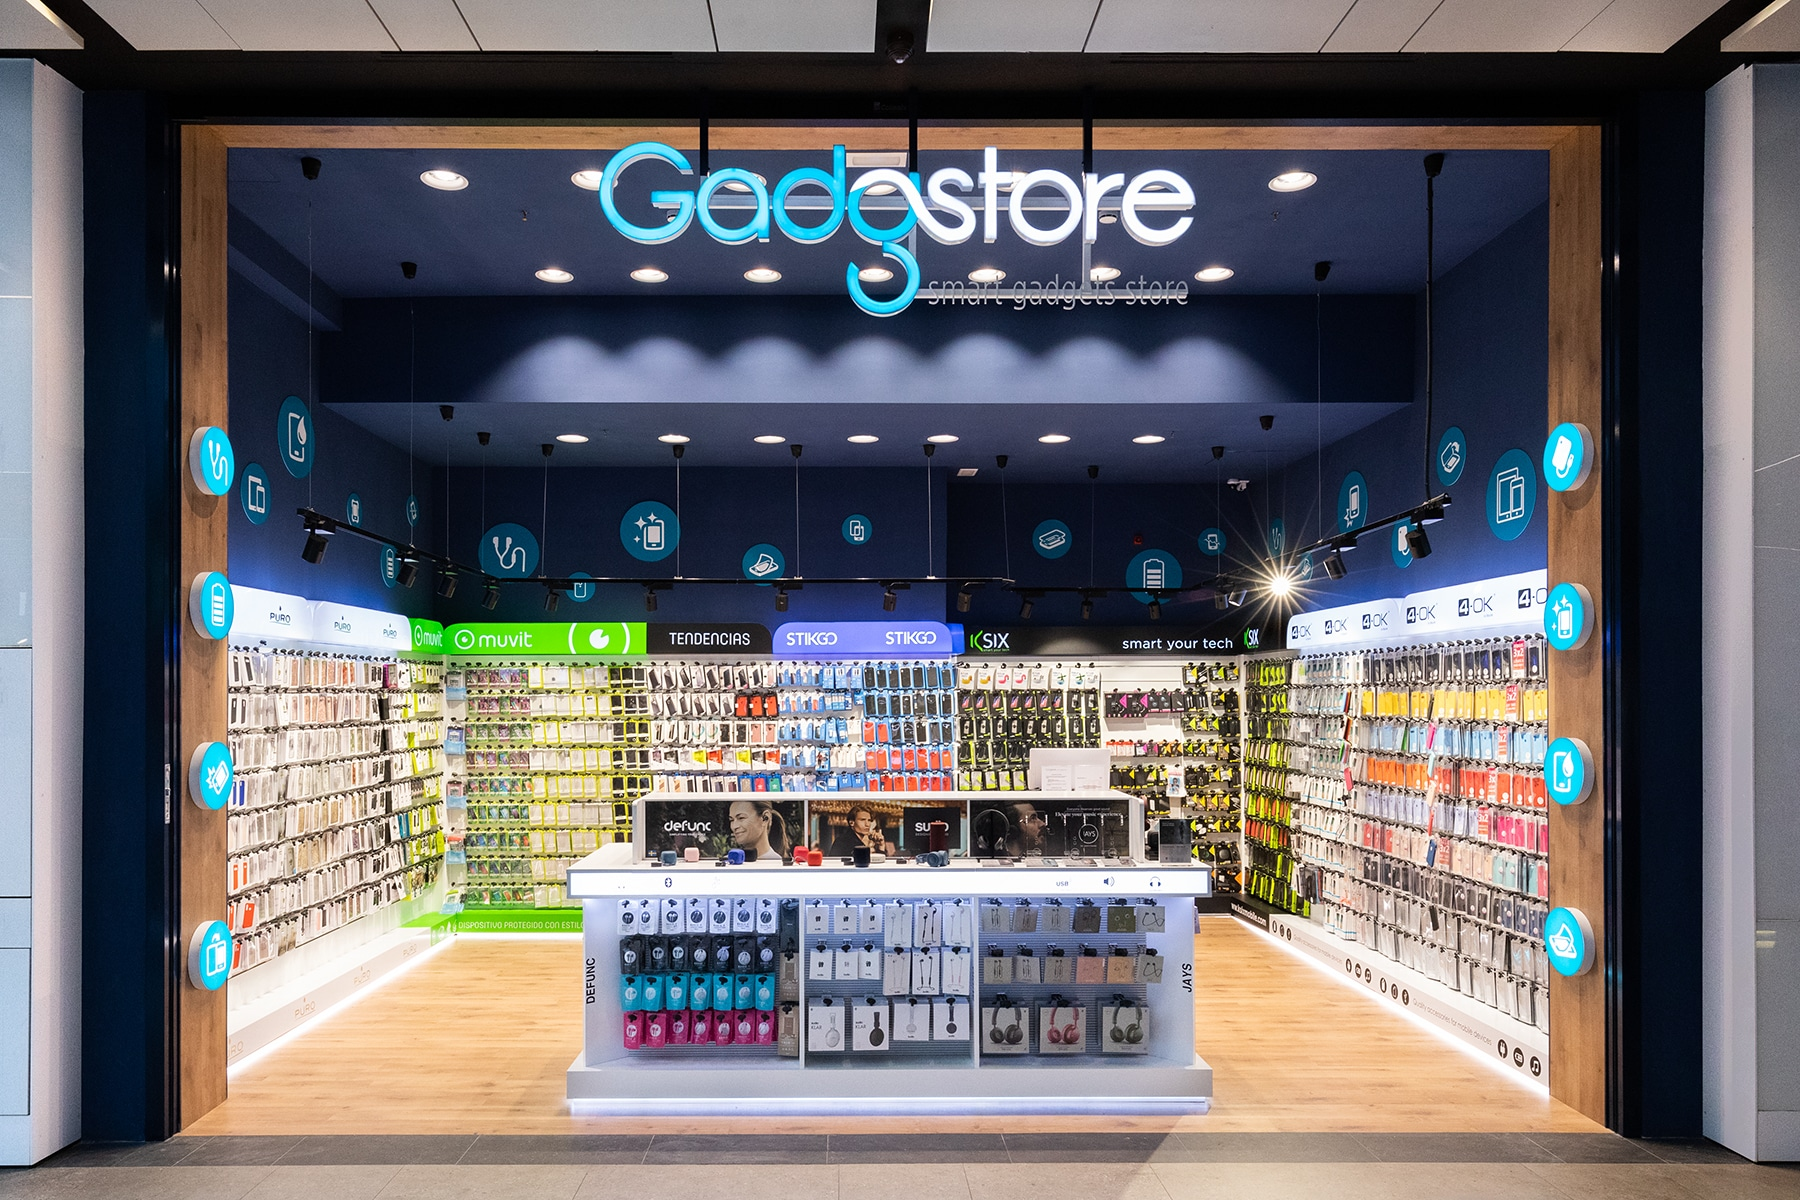 Gadgestore